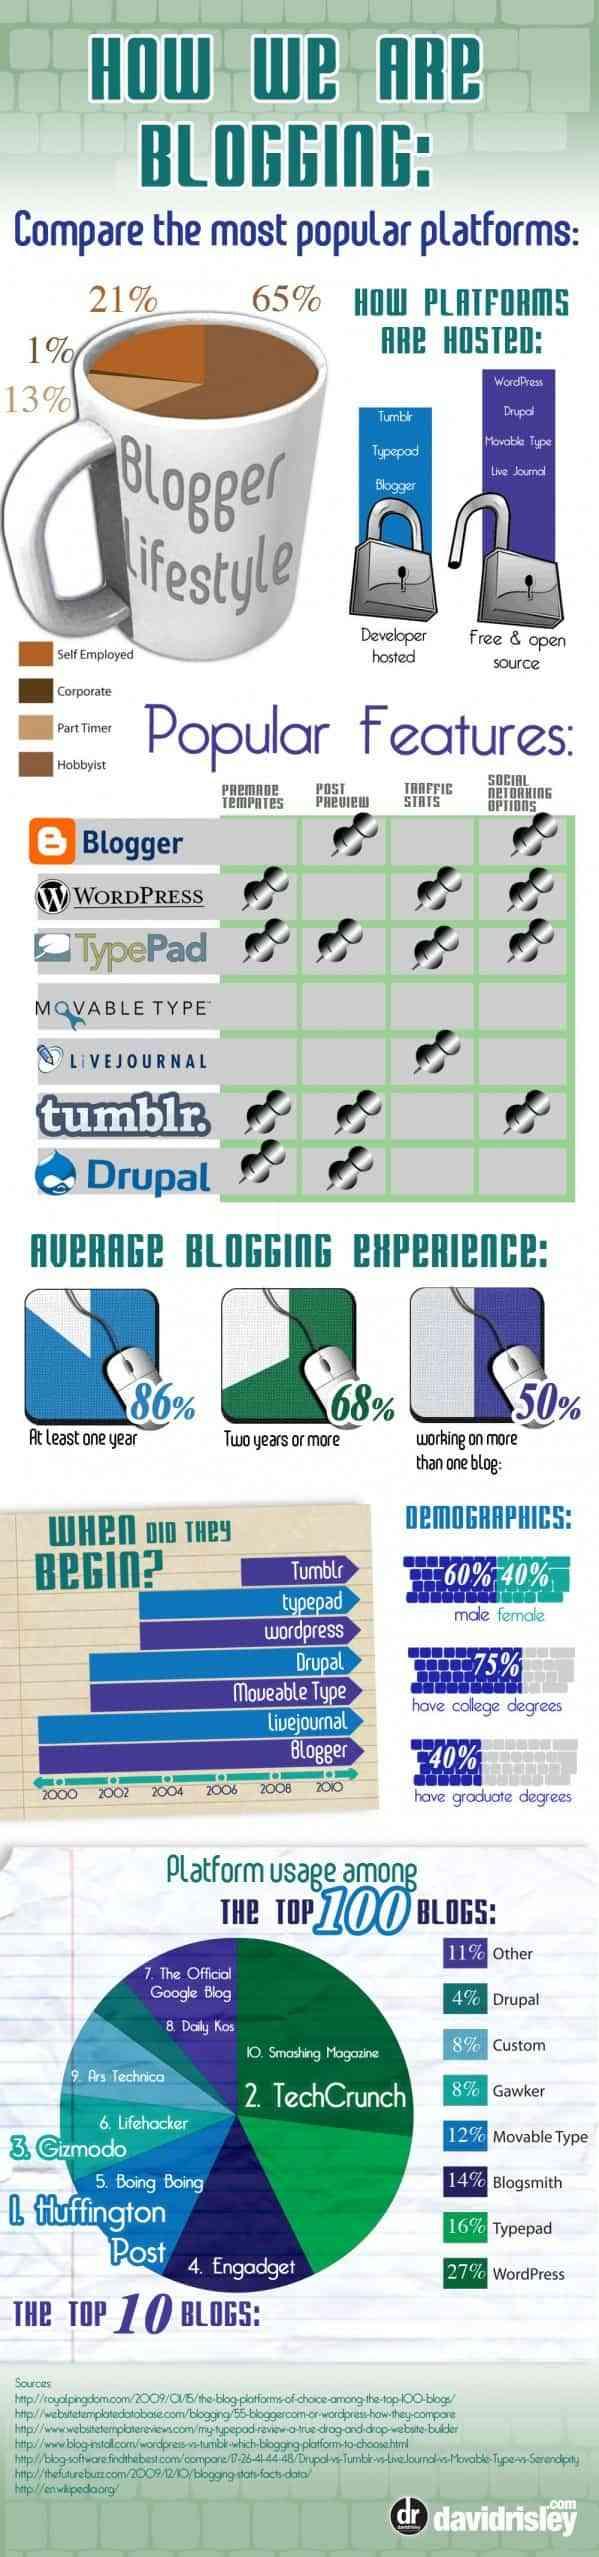 plataformas de blogs mas populares